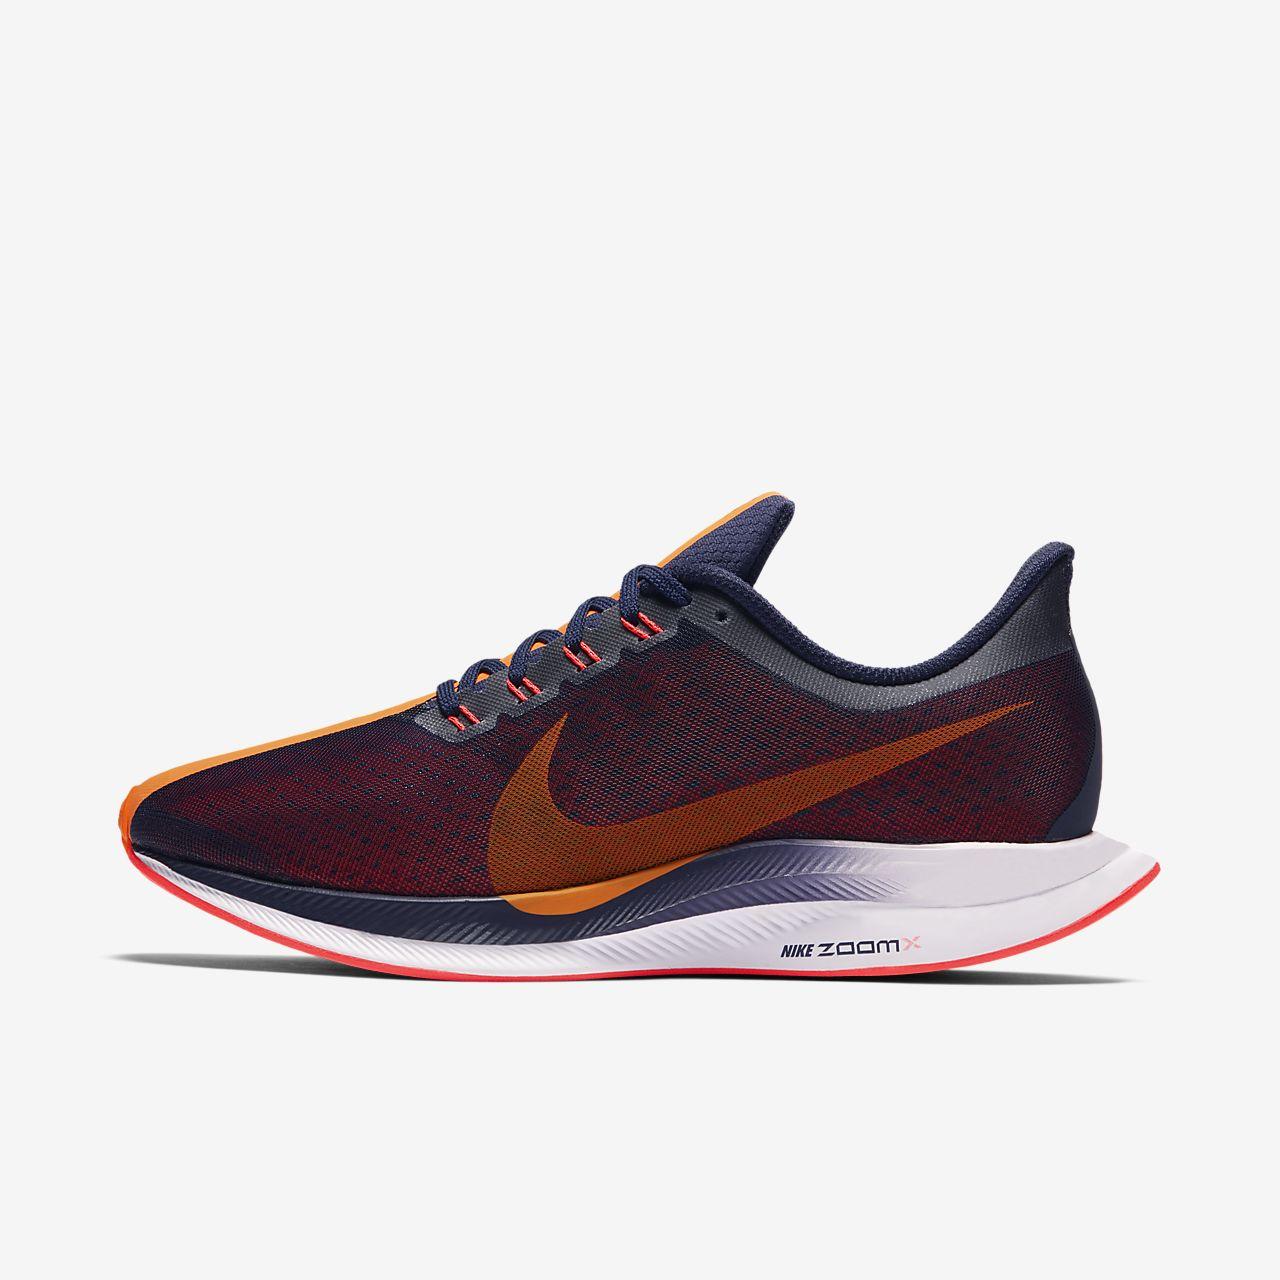 Sapatilhas de running Nike Zoom Pegasus Turbo para mulher